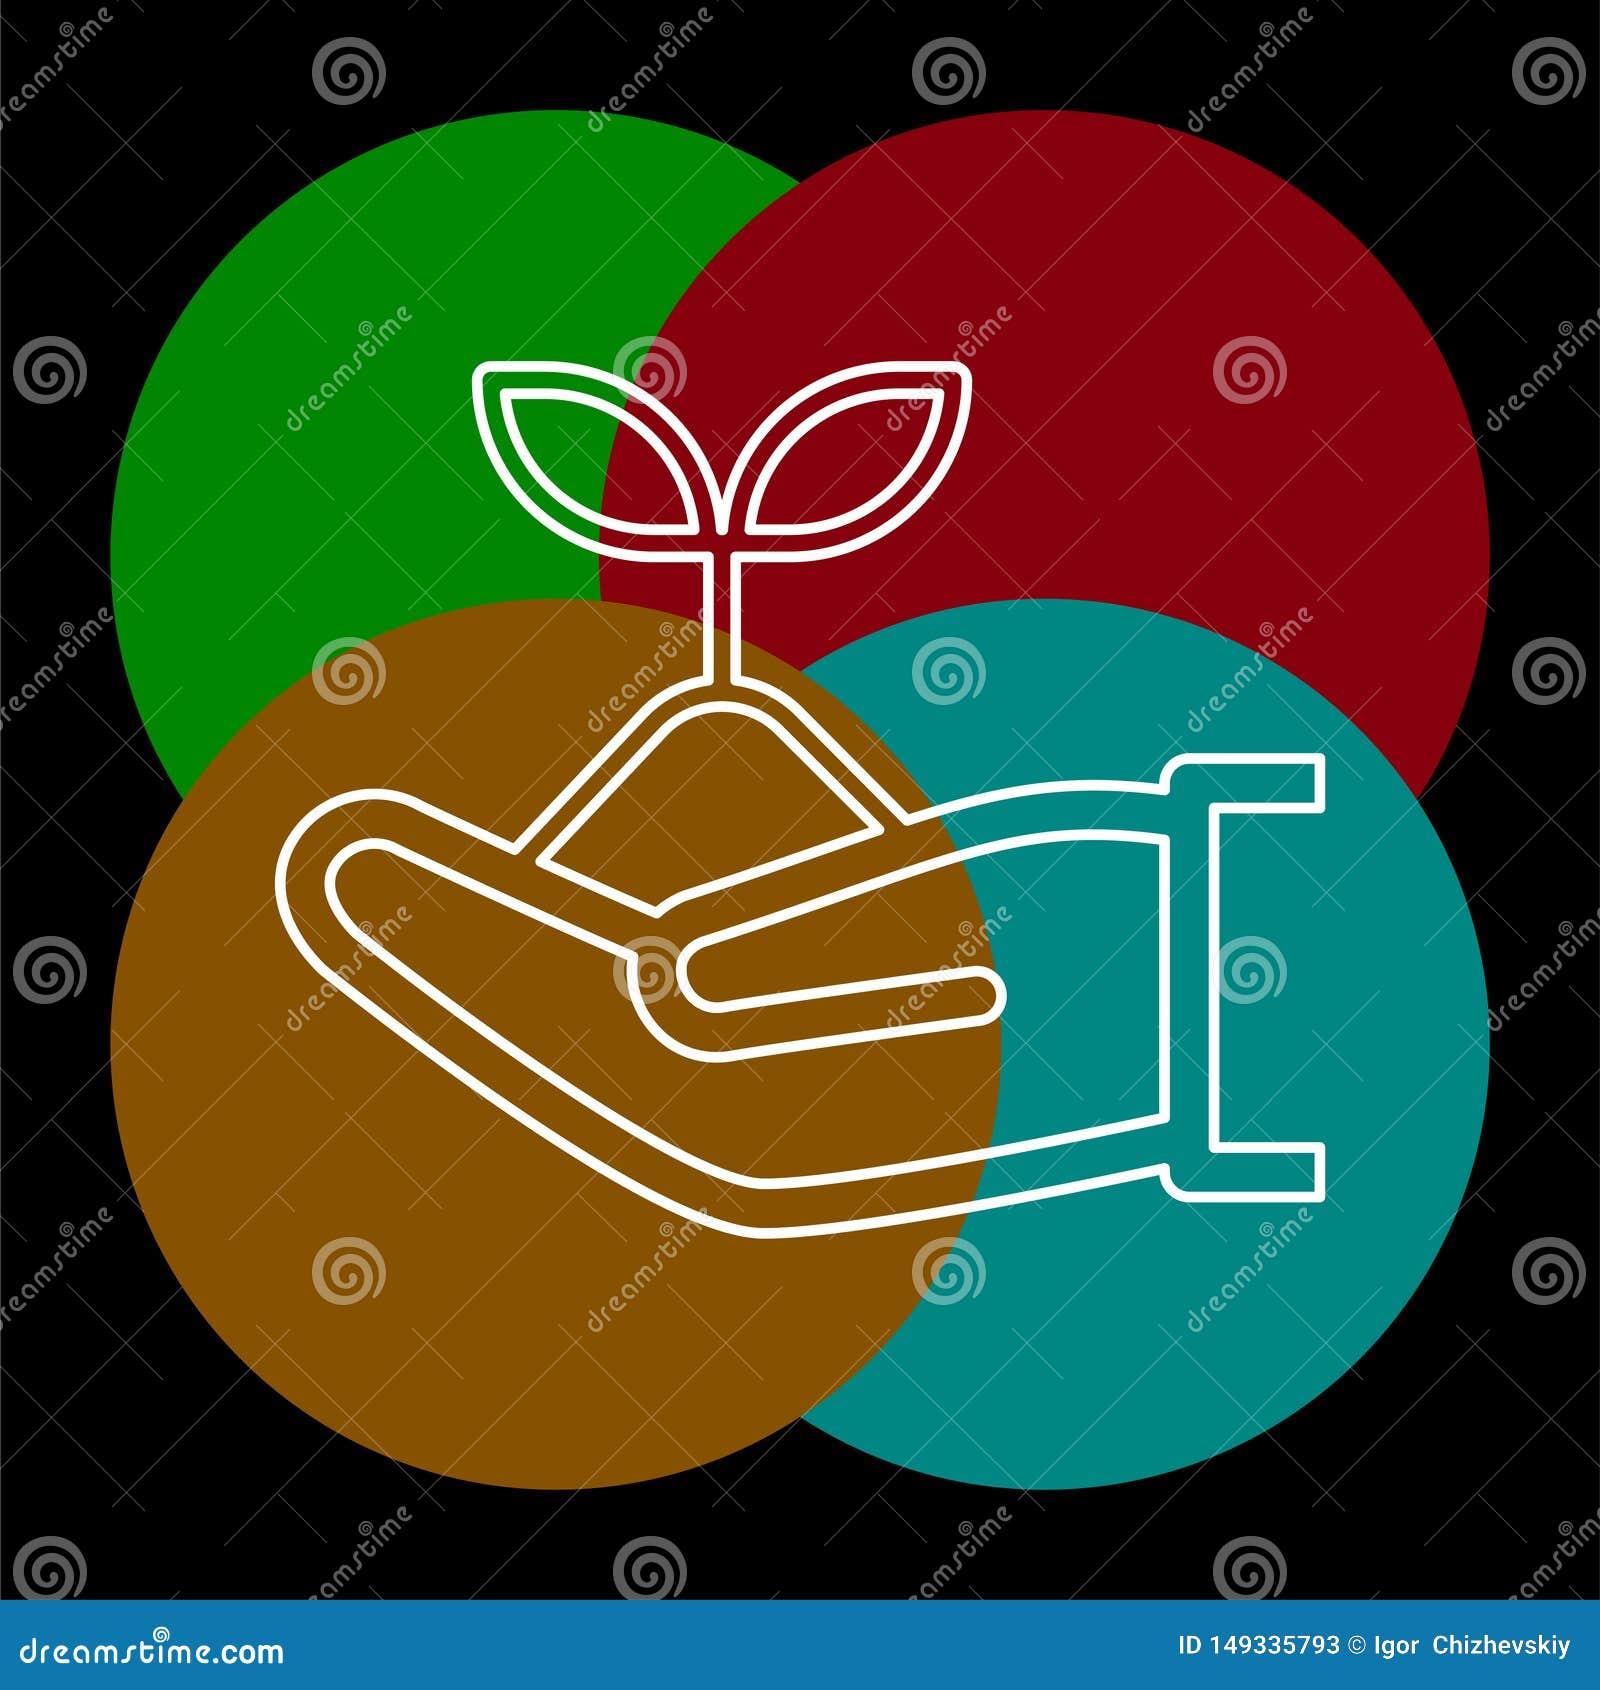 Vector green ecology sign, green environment